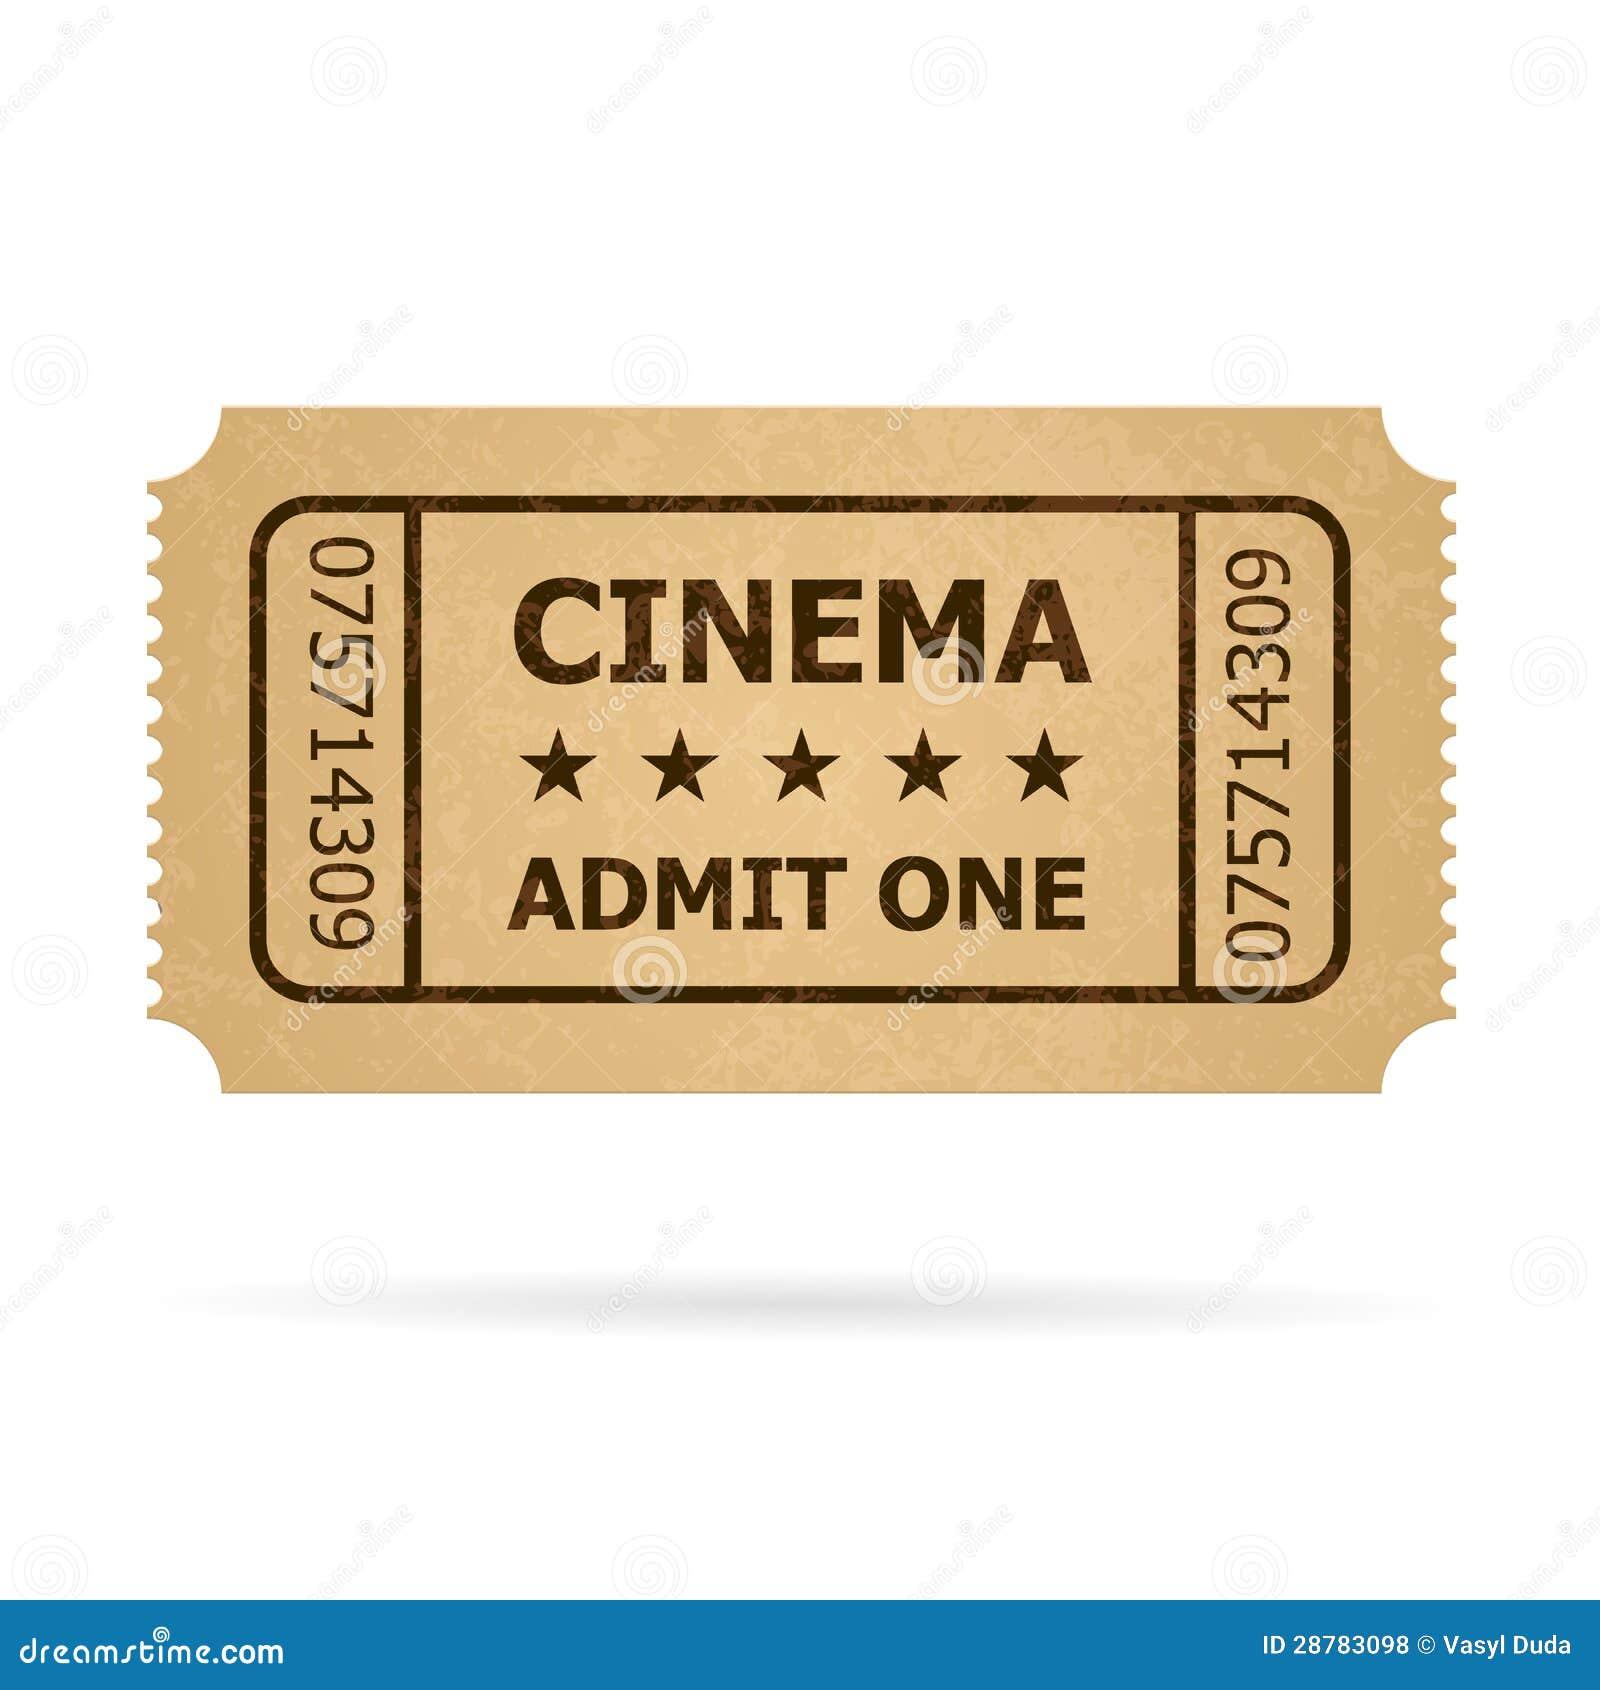 Retro Cinema Ticket Royalty Free Stock Photos Image